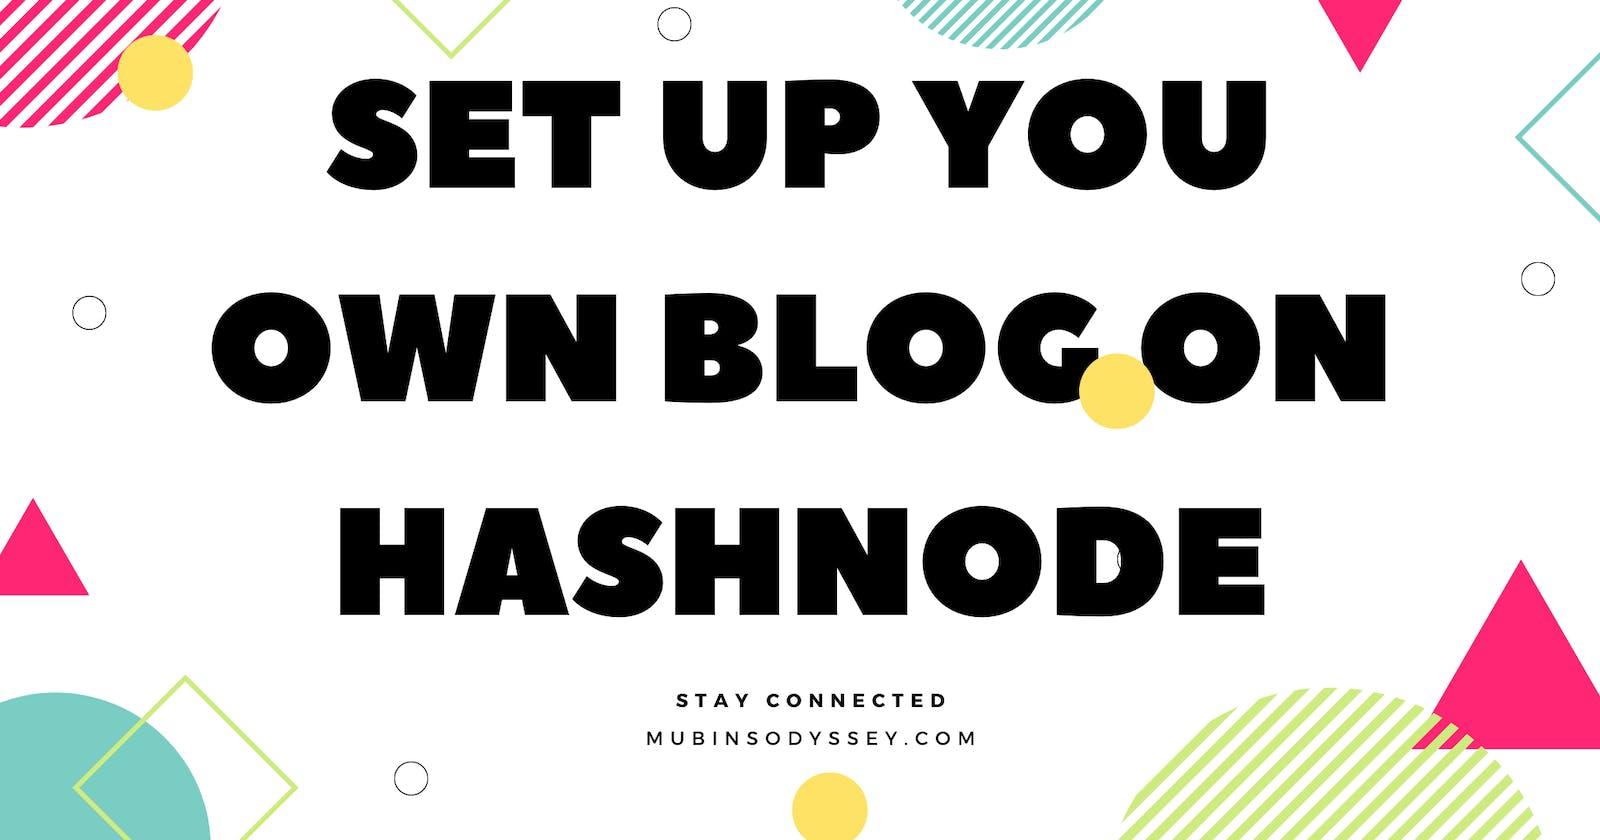 Set Up Your Own Blog on Hashnode